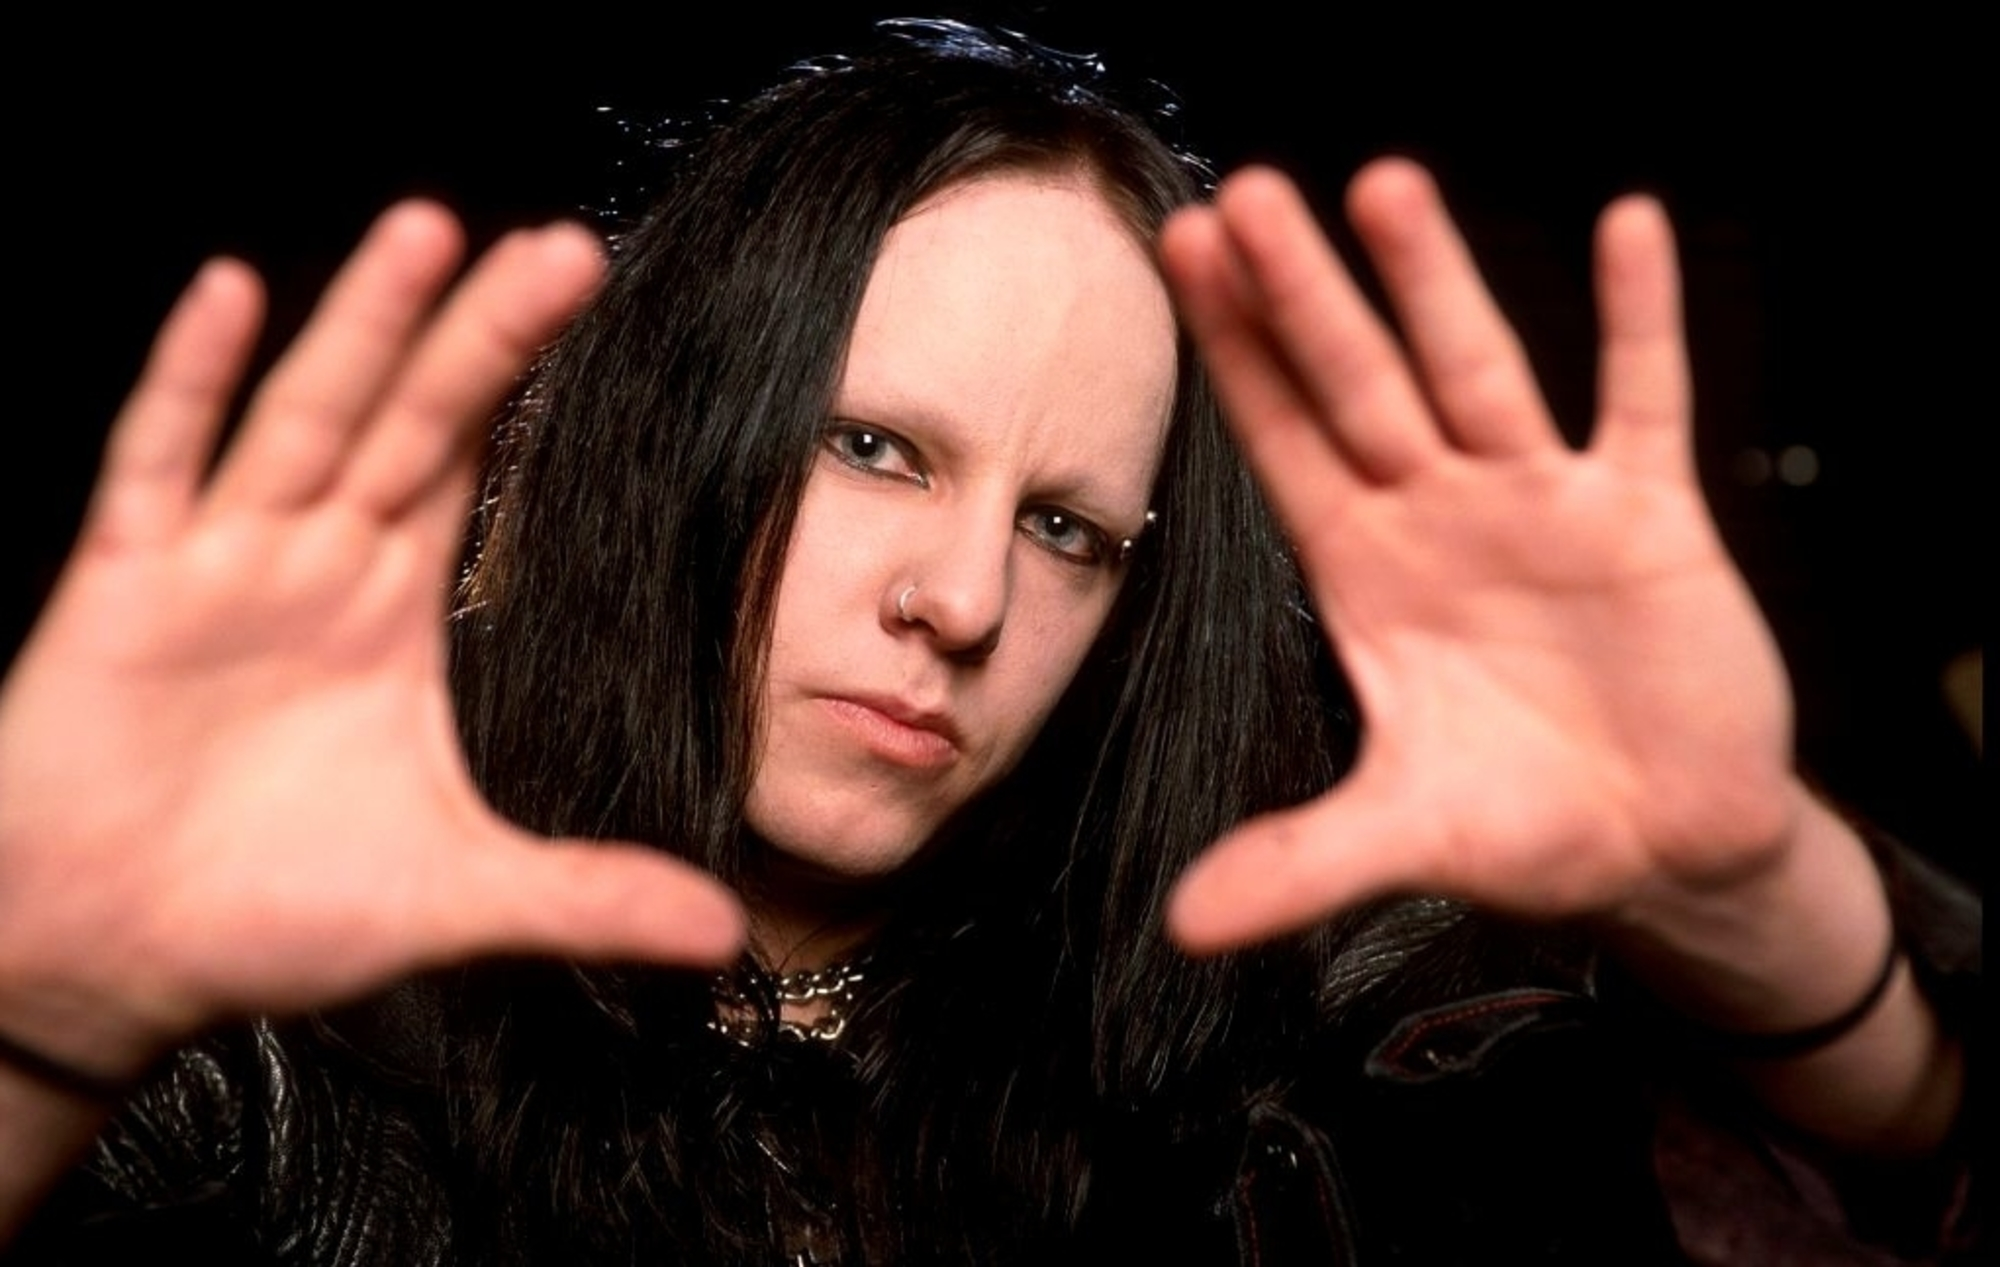 Slipknot's Joey Jordison